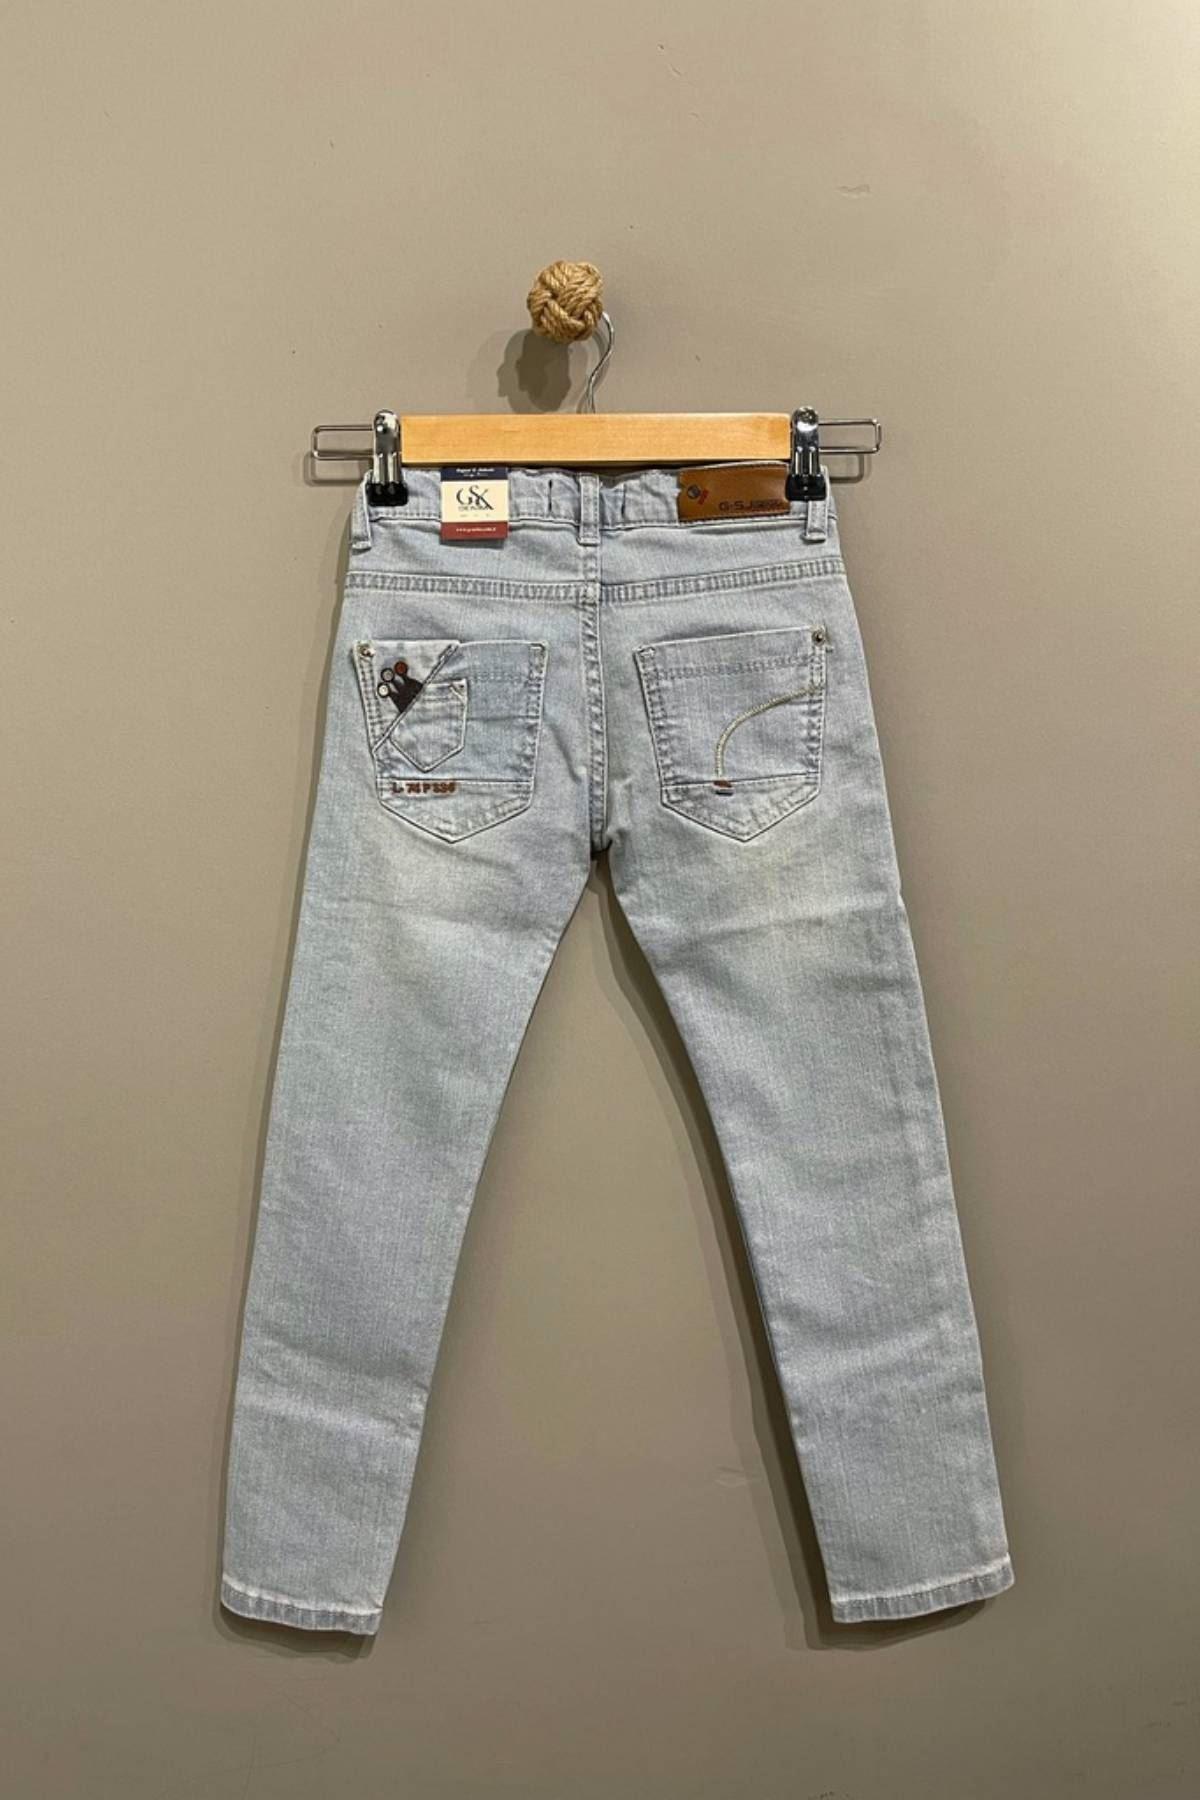 Erkek Çocuk Kot Pantolon